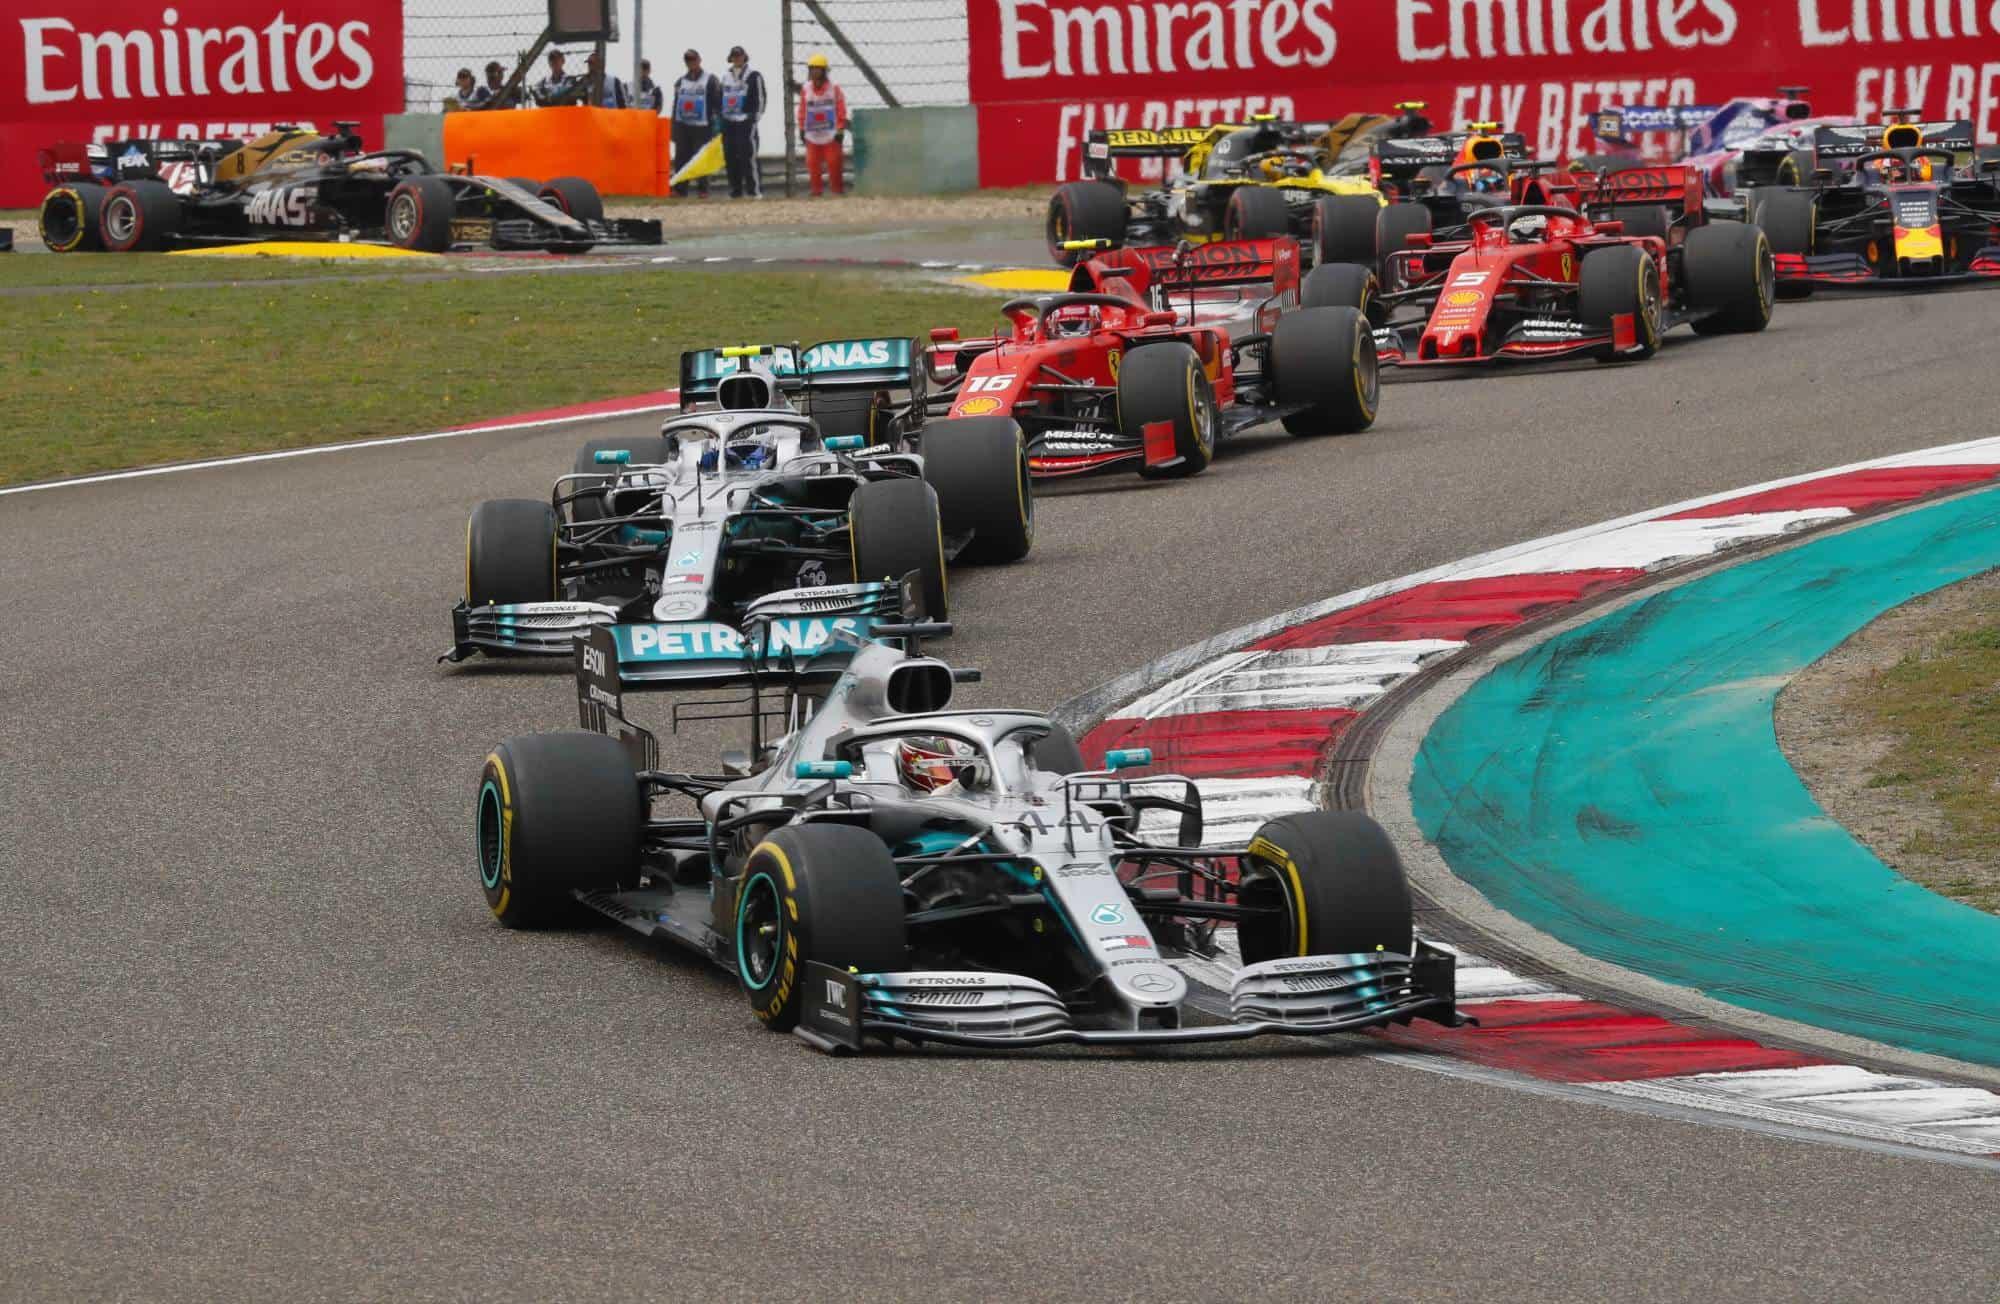 Hamilton leads Bottas Chinese GP F1 2019 start Photo Daimler